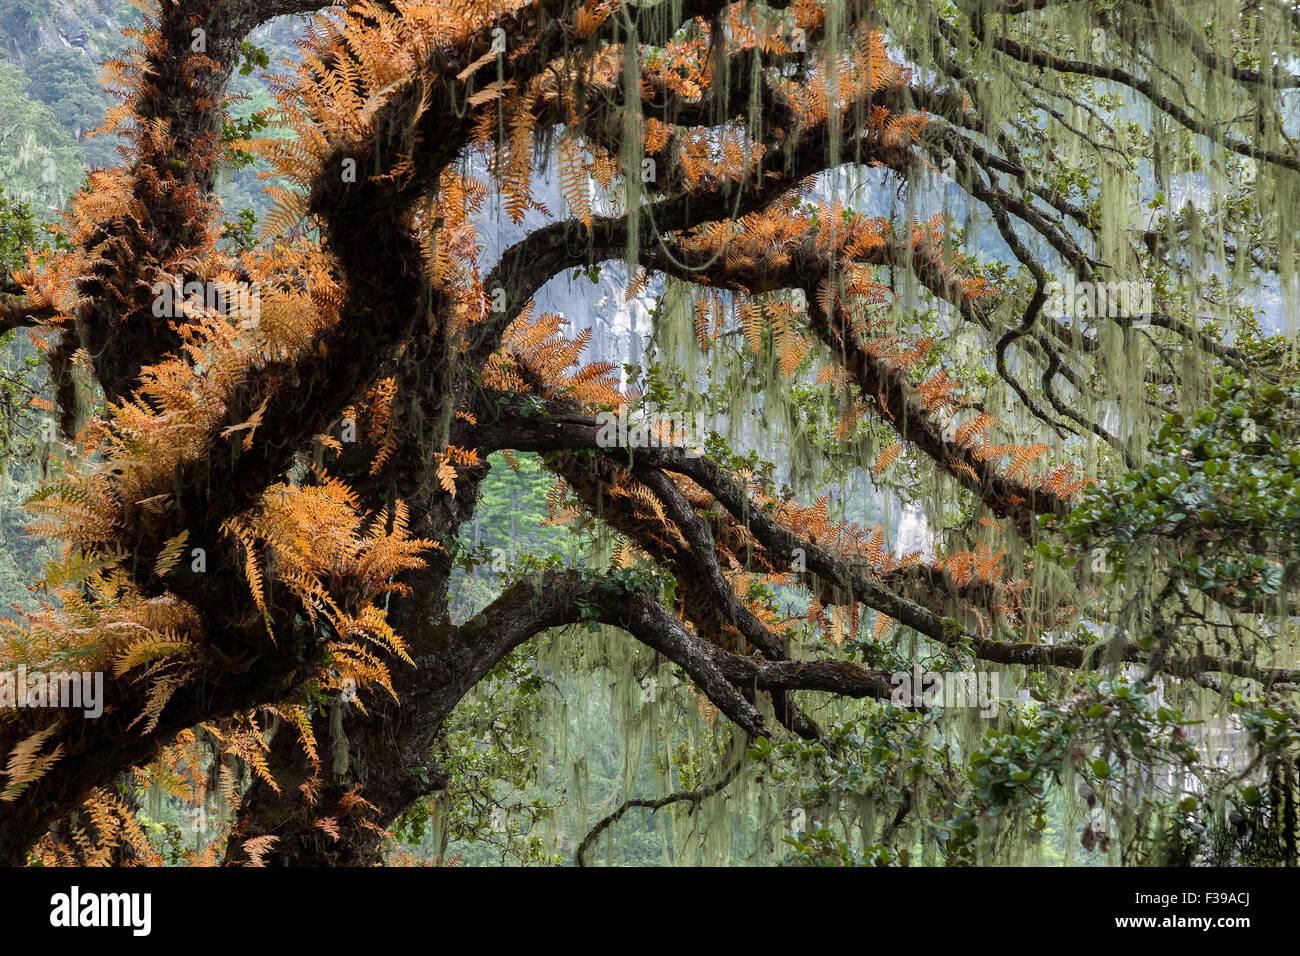 Forest around Tiger's Nest, Paro, Bhutan. Stock Photo